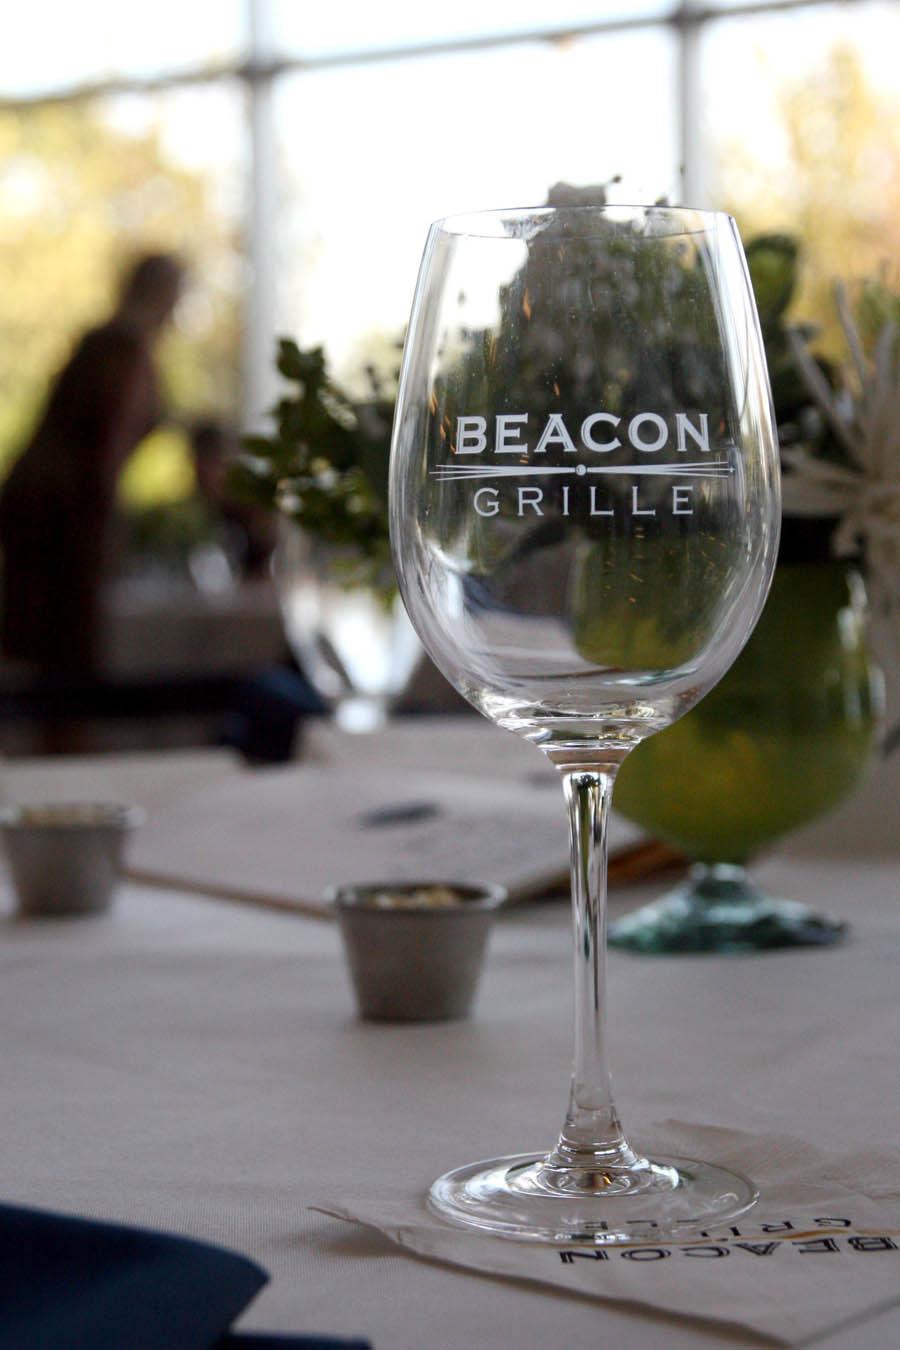 Beacon%20grille%20wine%20glass.full